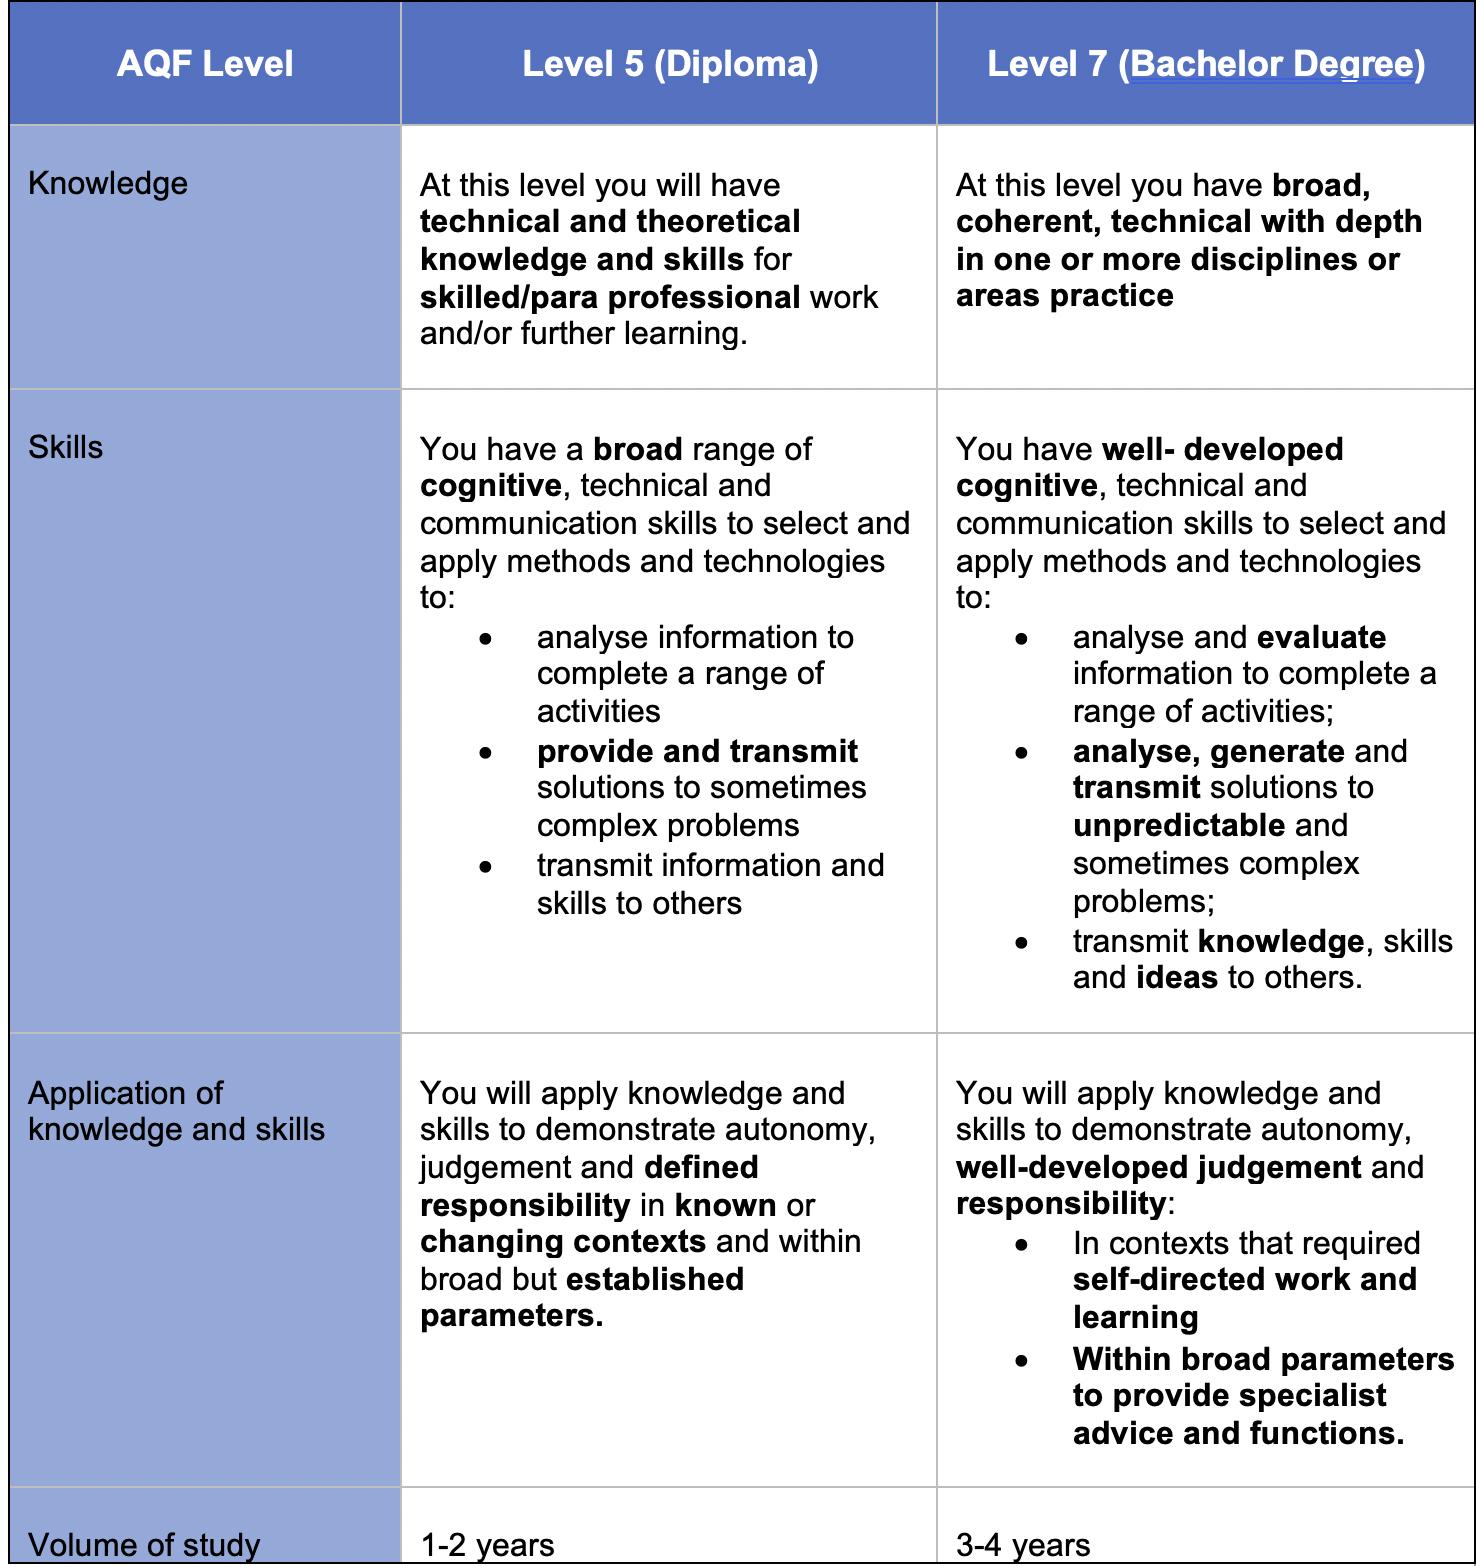 Source: Australian Qualifications Framework Second Edition January 2013